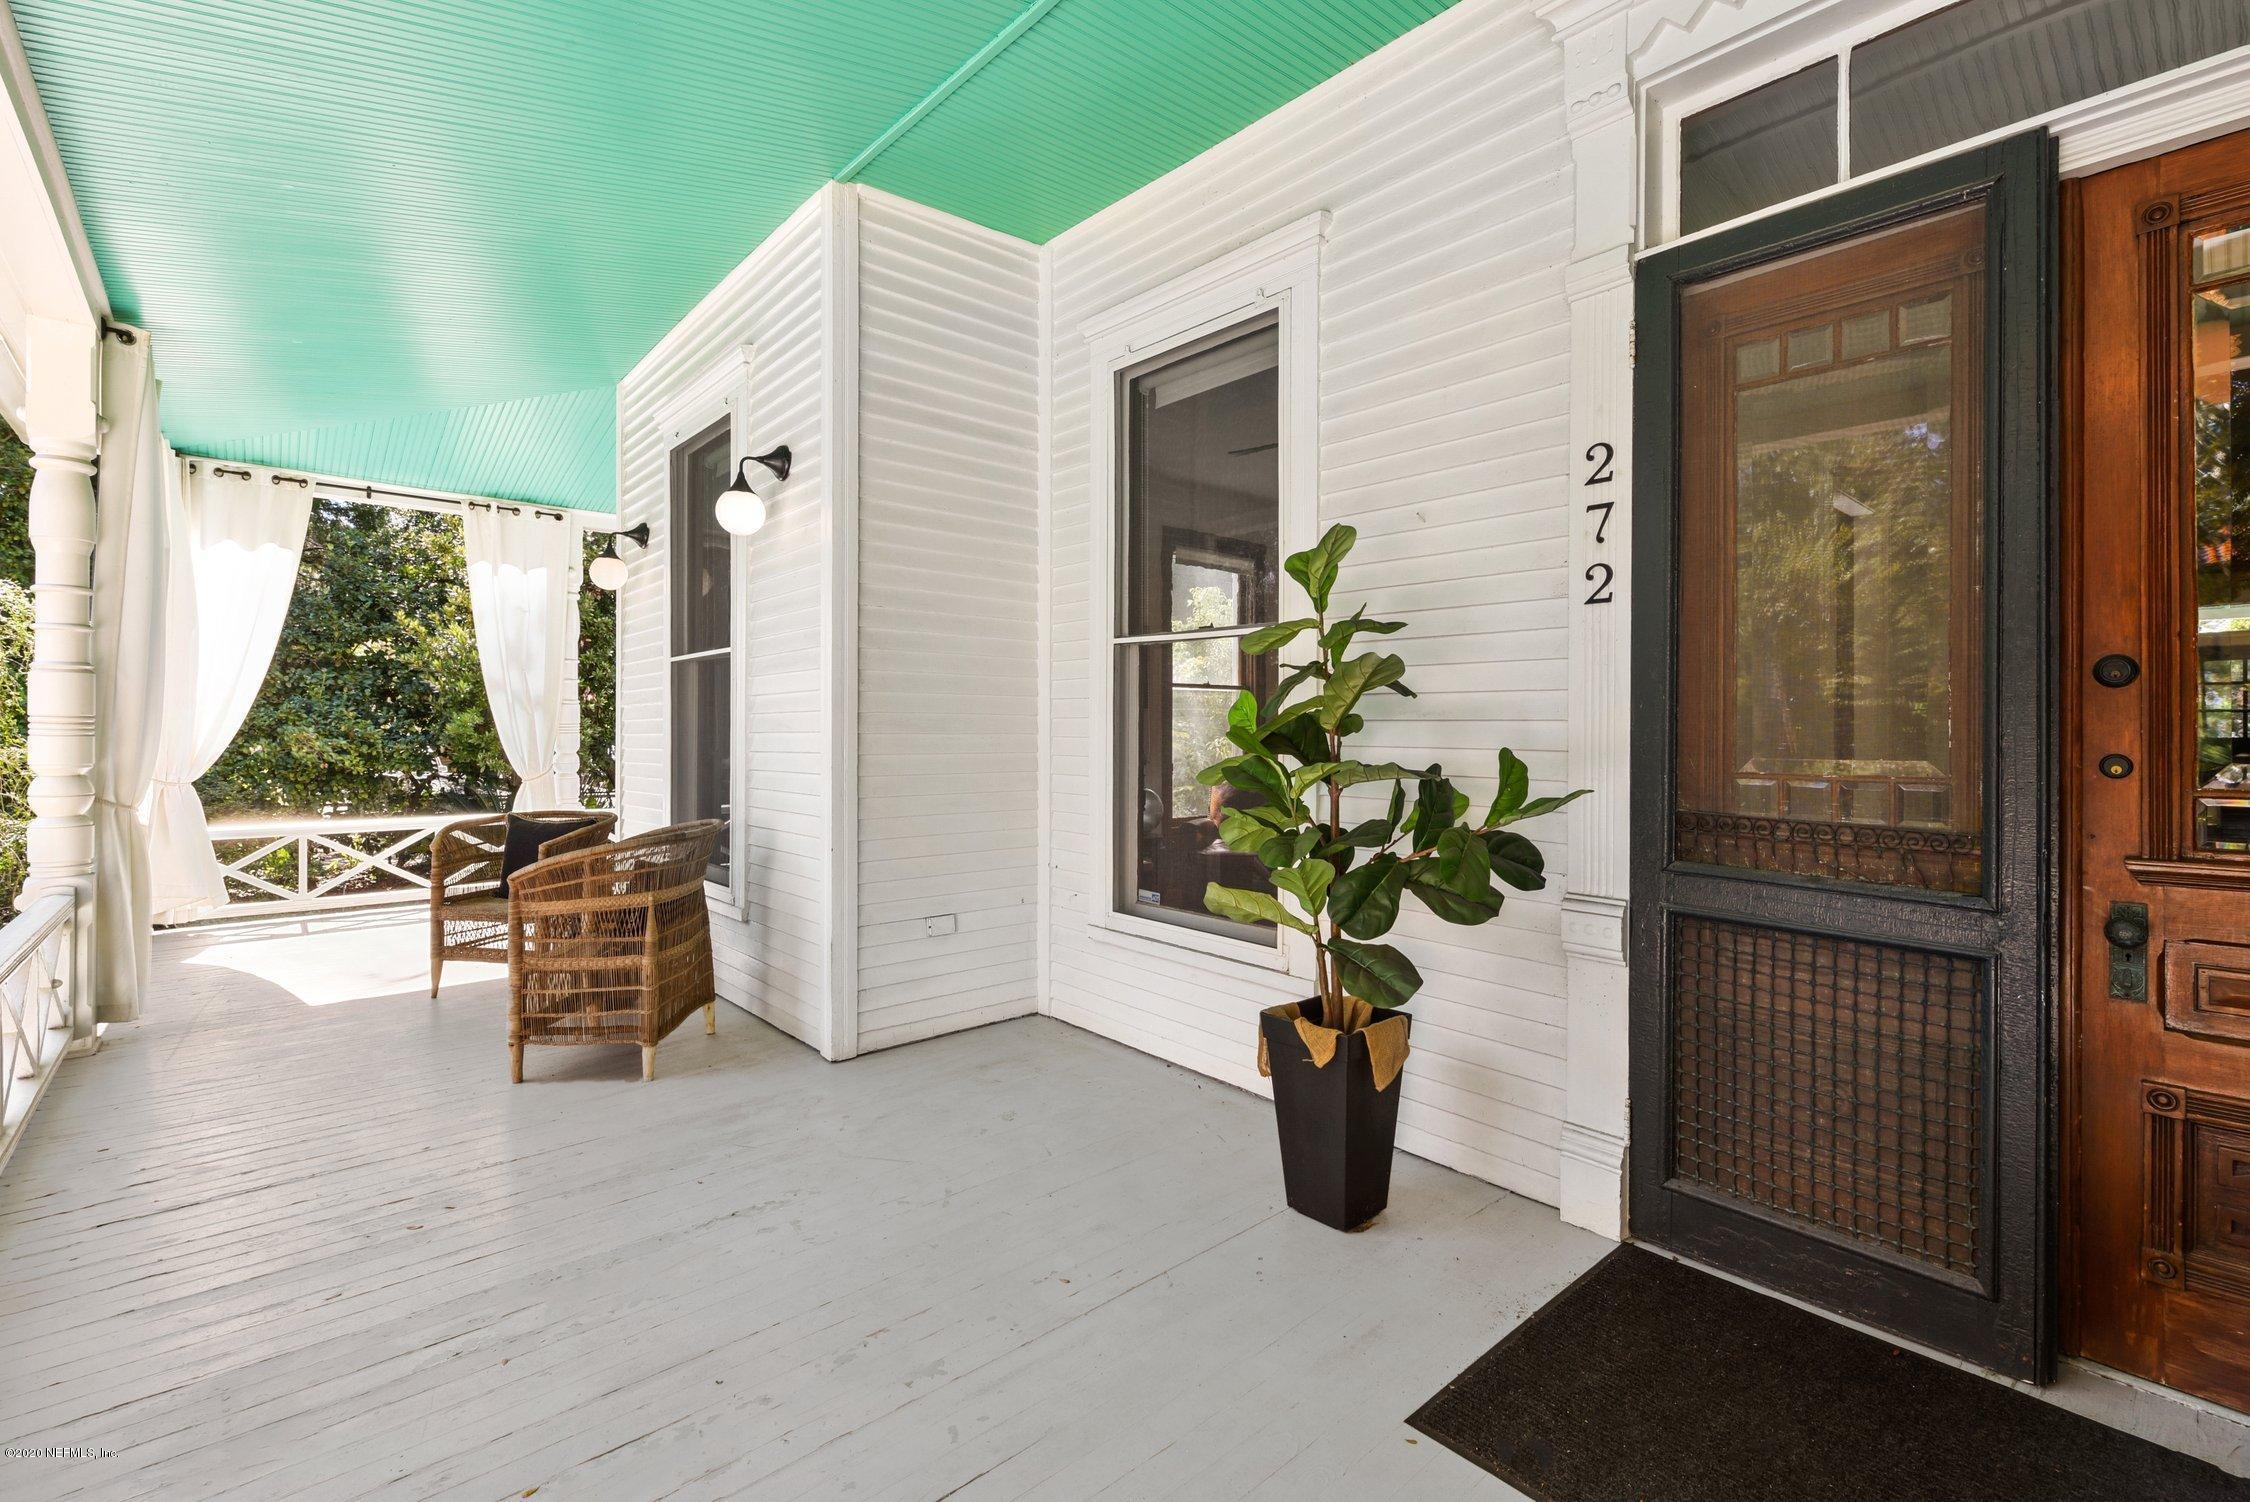 272 ST GEORGE, ST AUGUSTINE, FLORIDA 32084, 5 Bedrooms Bedrooms, ,4 BathroomsBathrooms,Residential,For sale,ST GEORGE,1082913